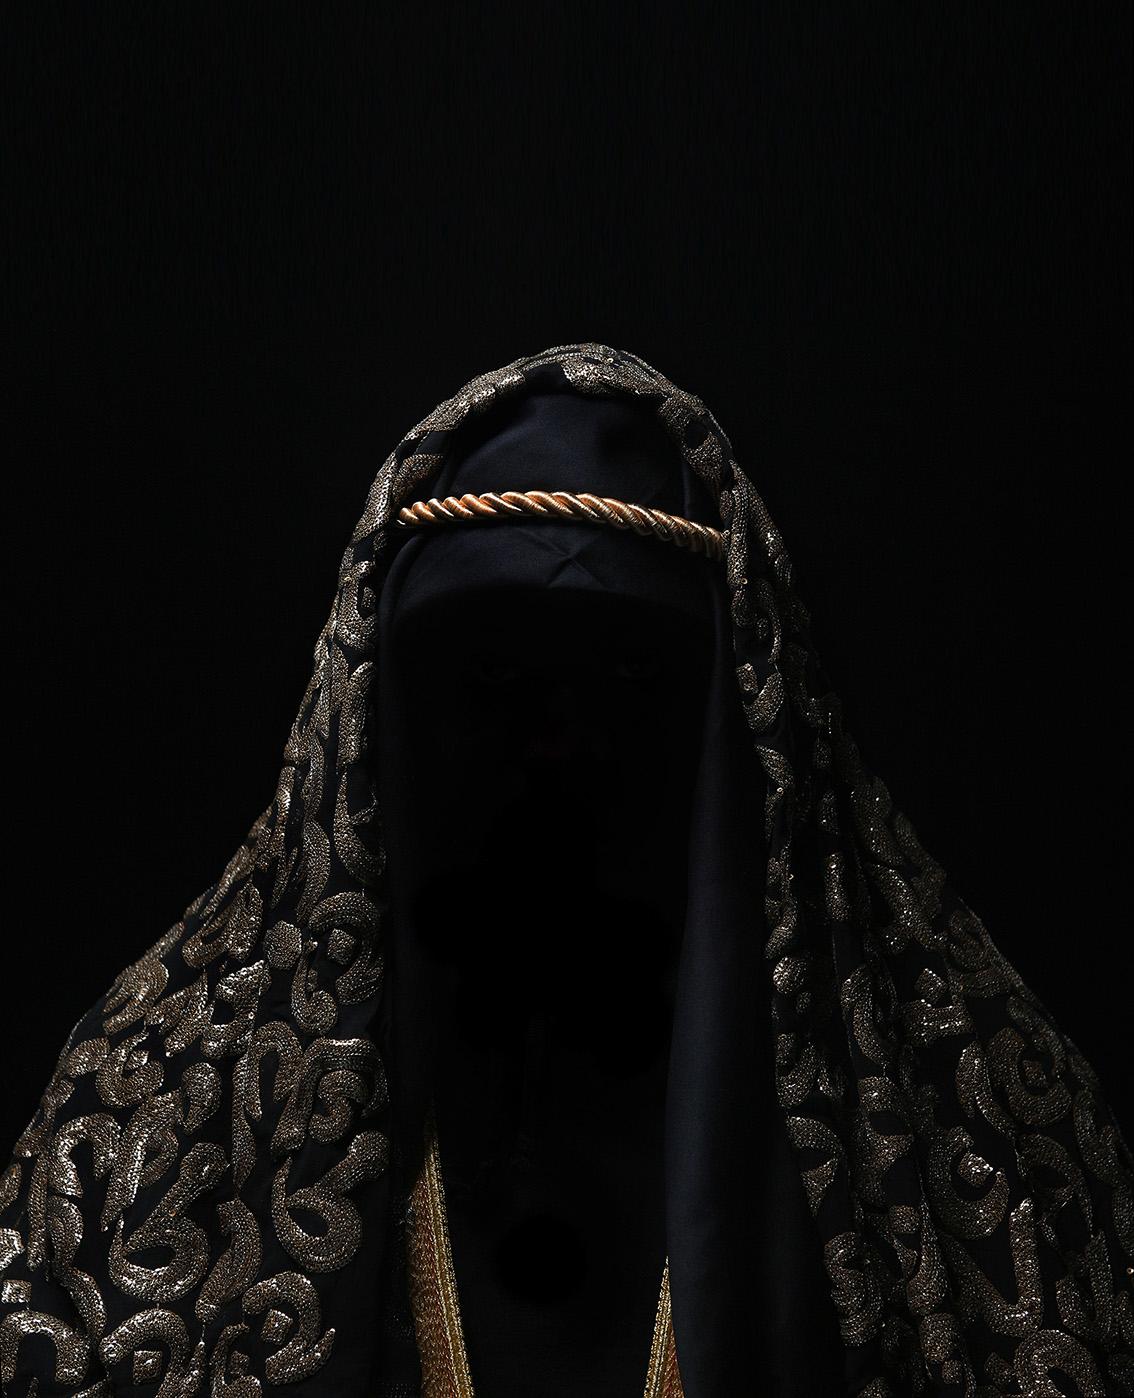 Wahib Chehata,  Sans titre , 2018, 185 x 150 cm, tirage sur papier Baryté  © Wahib Chehata, Courtoisie A2Z Gallery